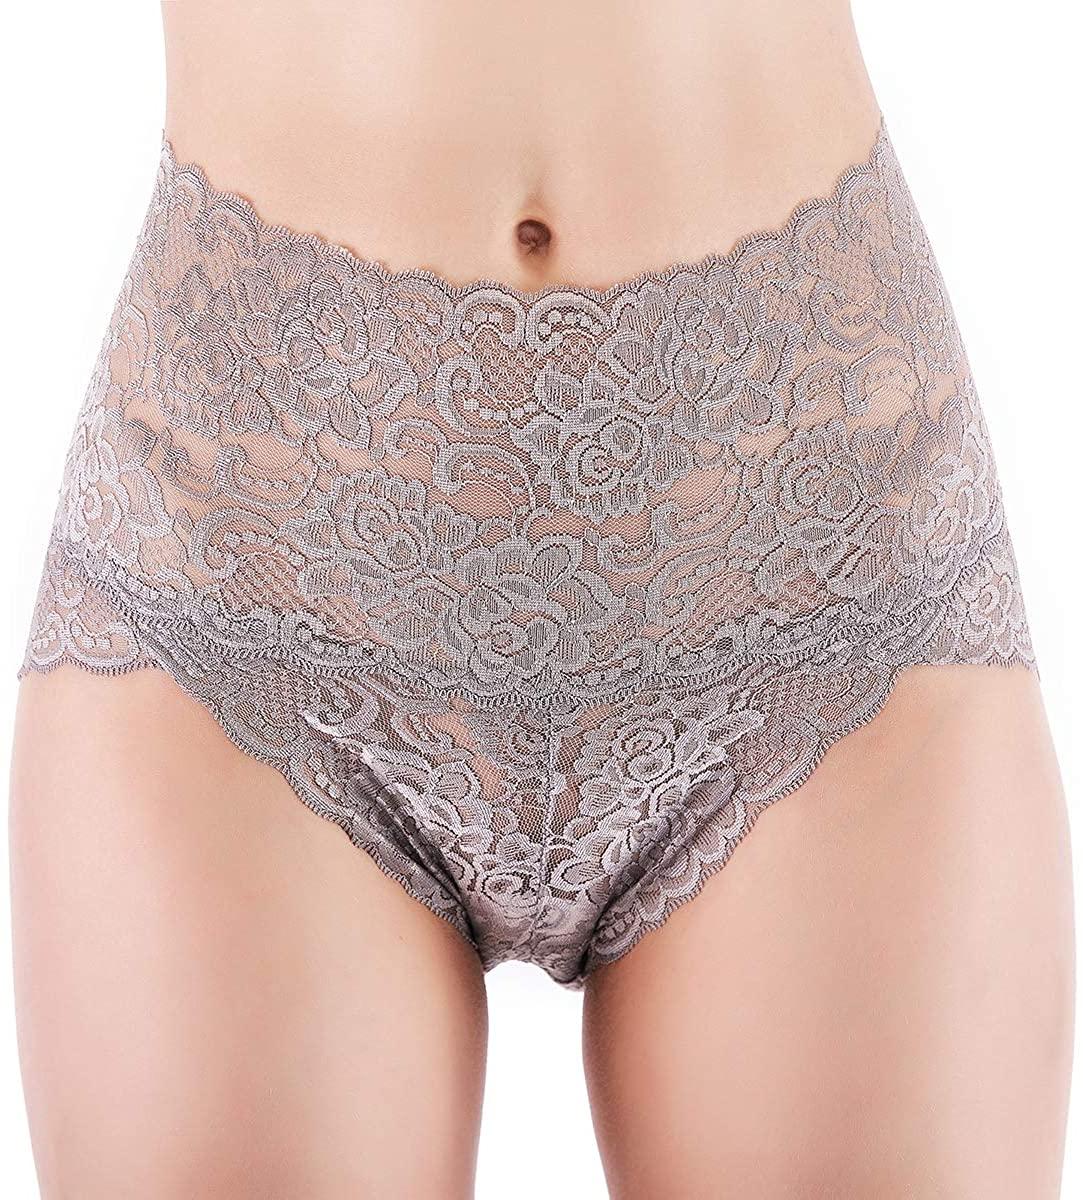 Women Lace Underwear High Waist Lingerie Tummy Control Panties Briefs